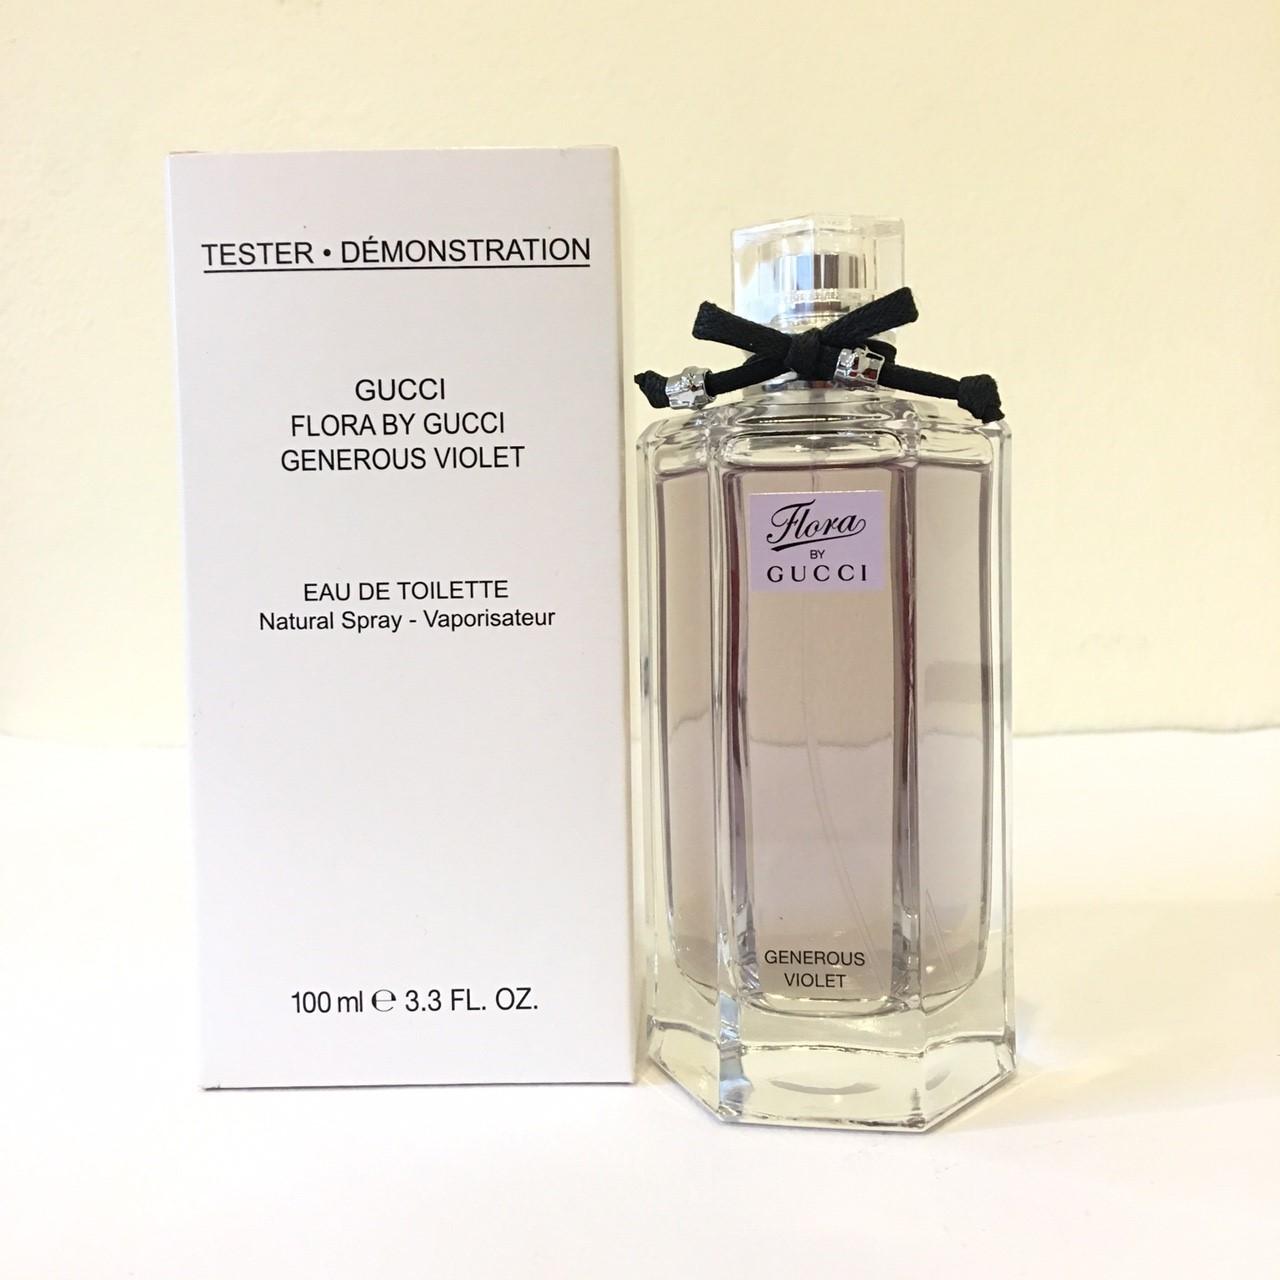 4e7e64f70bf น้ำหอม Gucci Flora By Gucci Generous Violet EDT 100ml สีม่วง กล่องขาว -  perfumesbeautymall น้ำหอมแท้ จิ๋วทดลอง แบ่งขาย น้ำหอมมือสอง กล่องเทสเตอร์  กล่องซีล ...